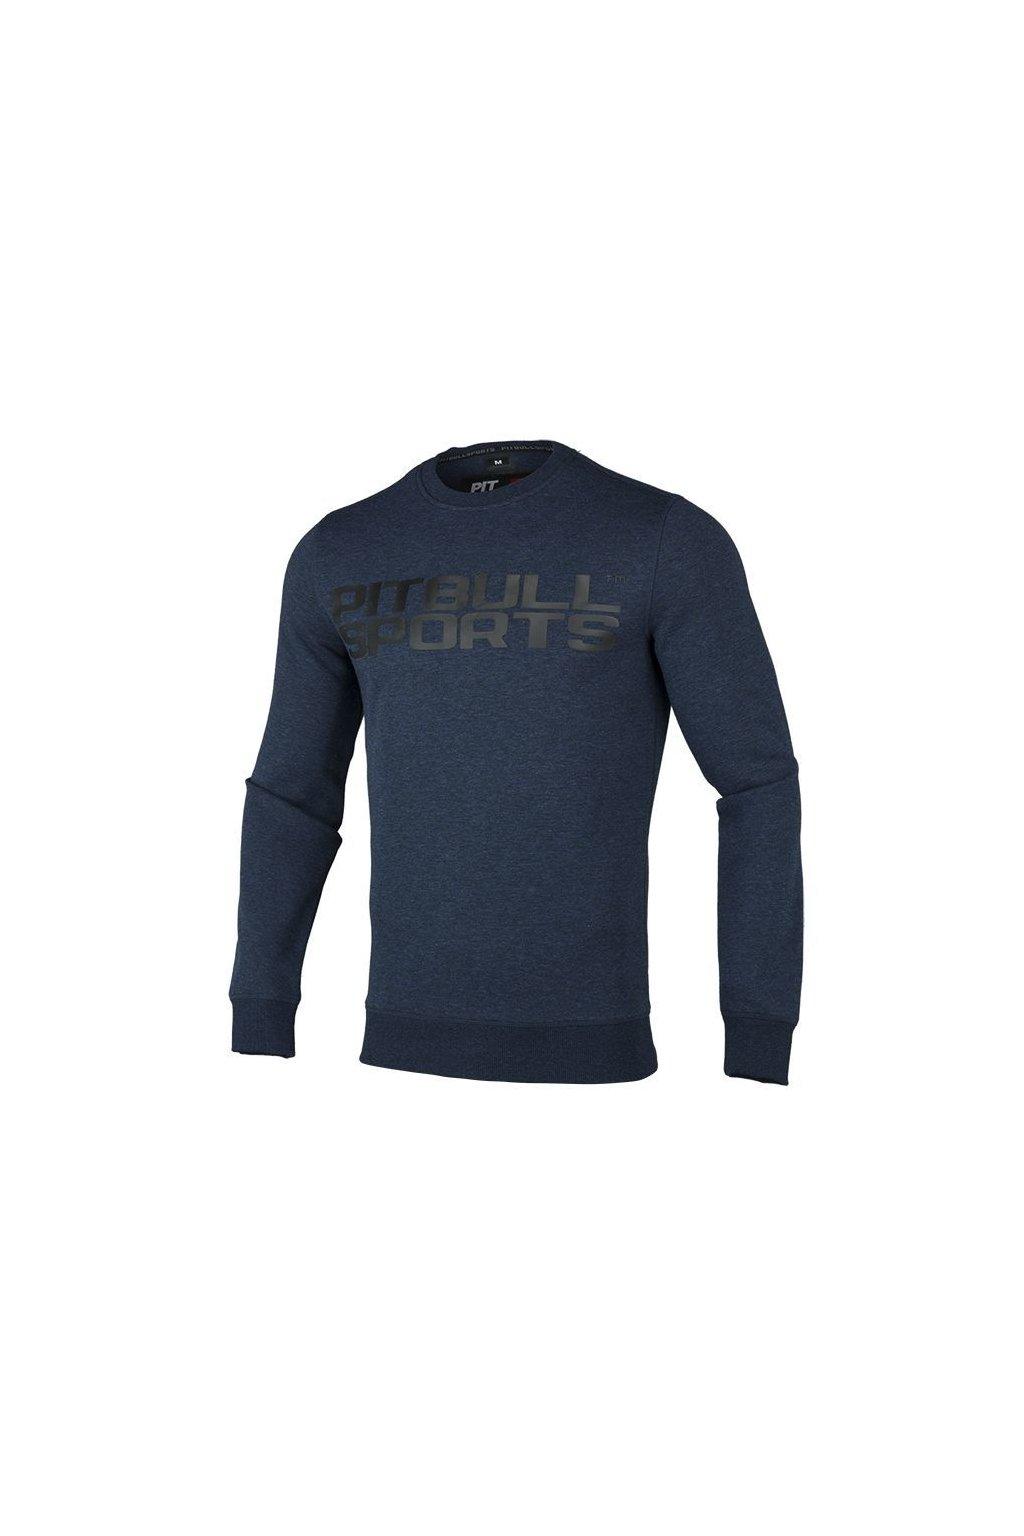 PitBull West Coast - mikina FLIPPER tmavě modrá obr1